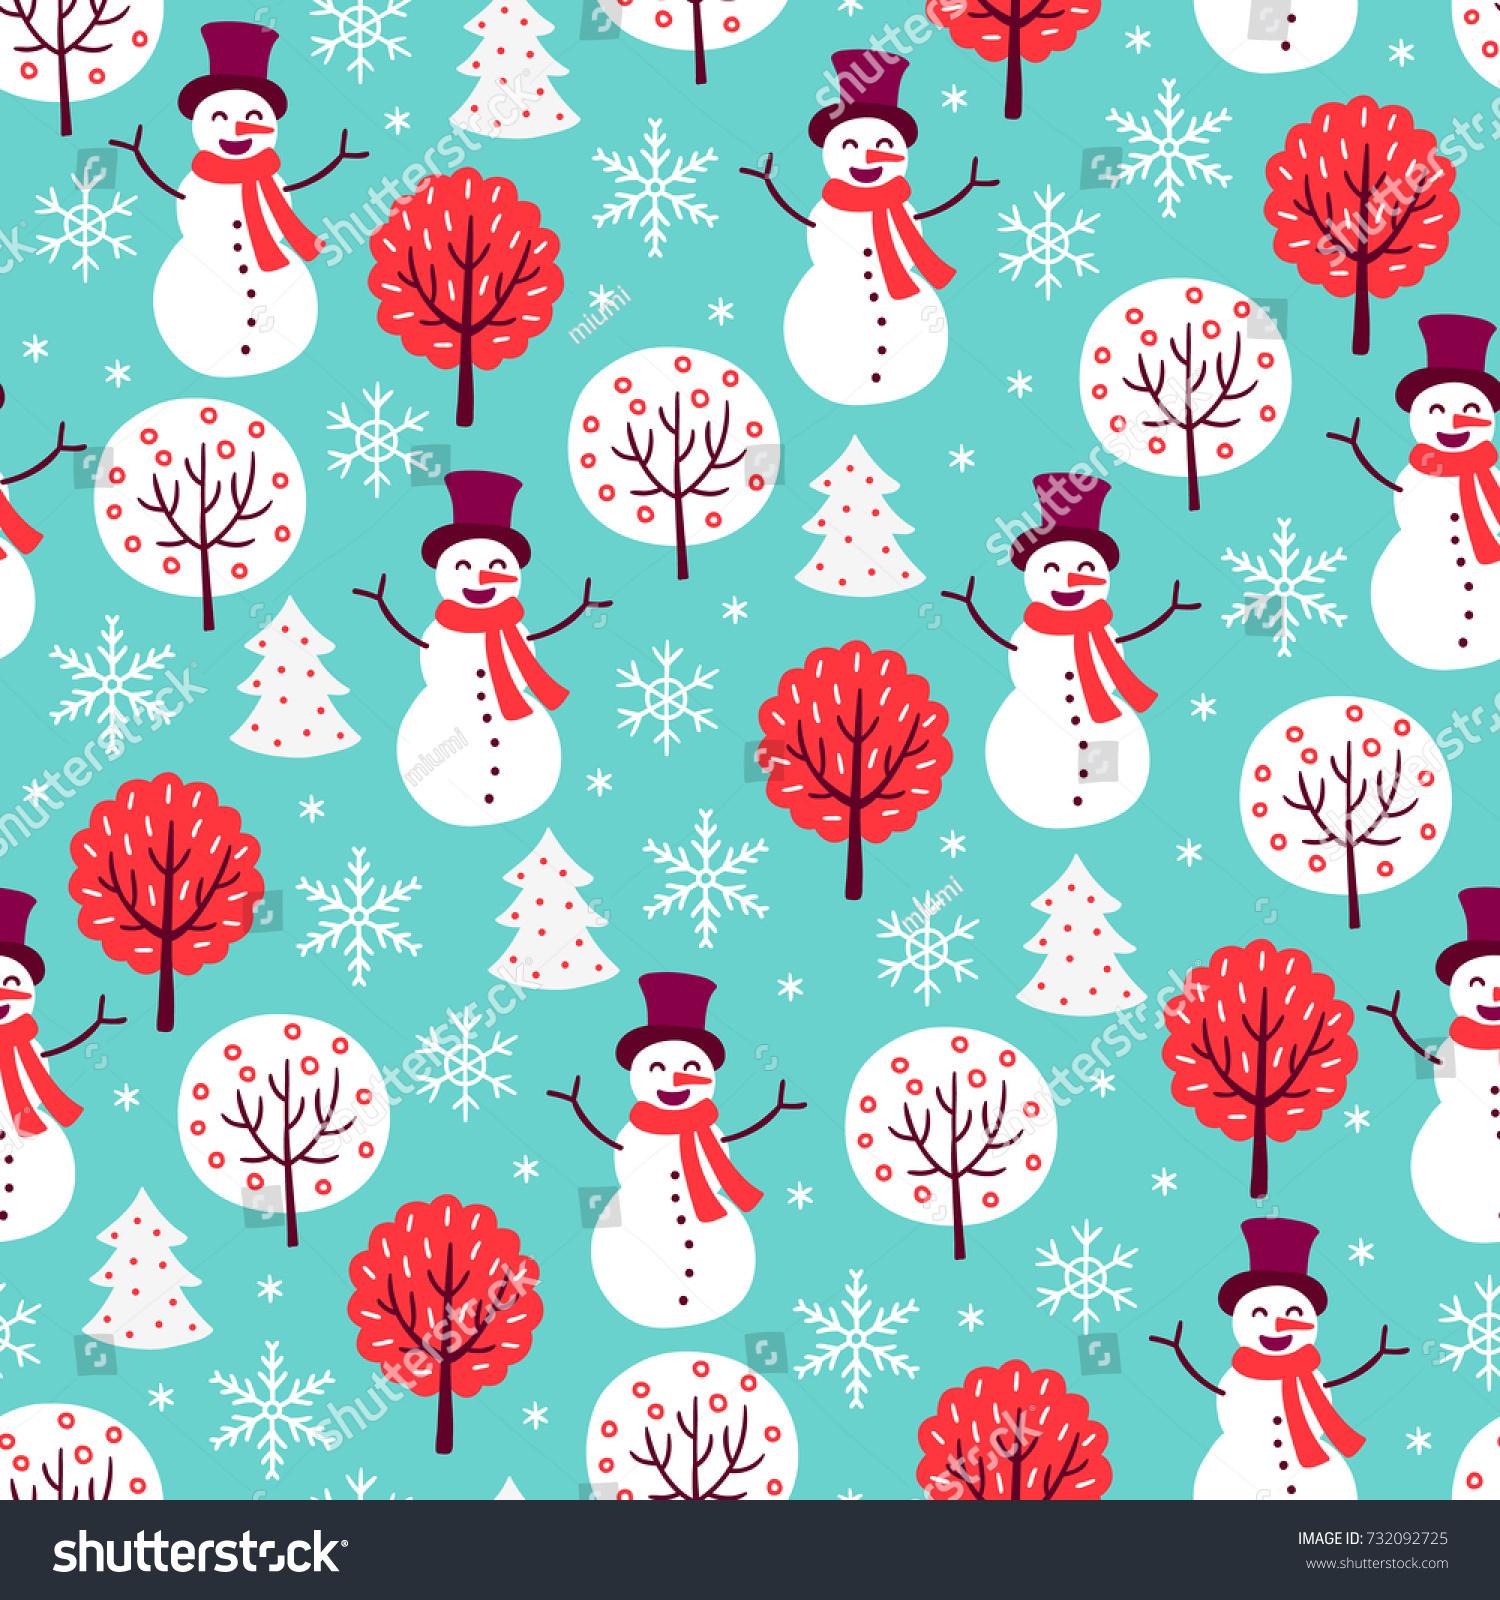 Blue Christmas Tree Wallpaper: Christmas Seamless Pattern Snowman Tree Snowflake Stock